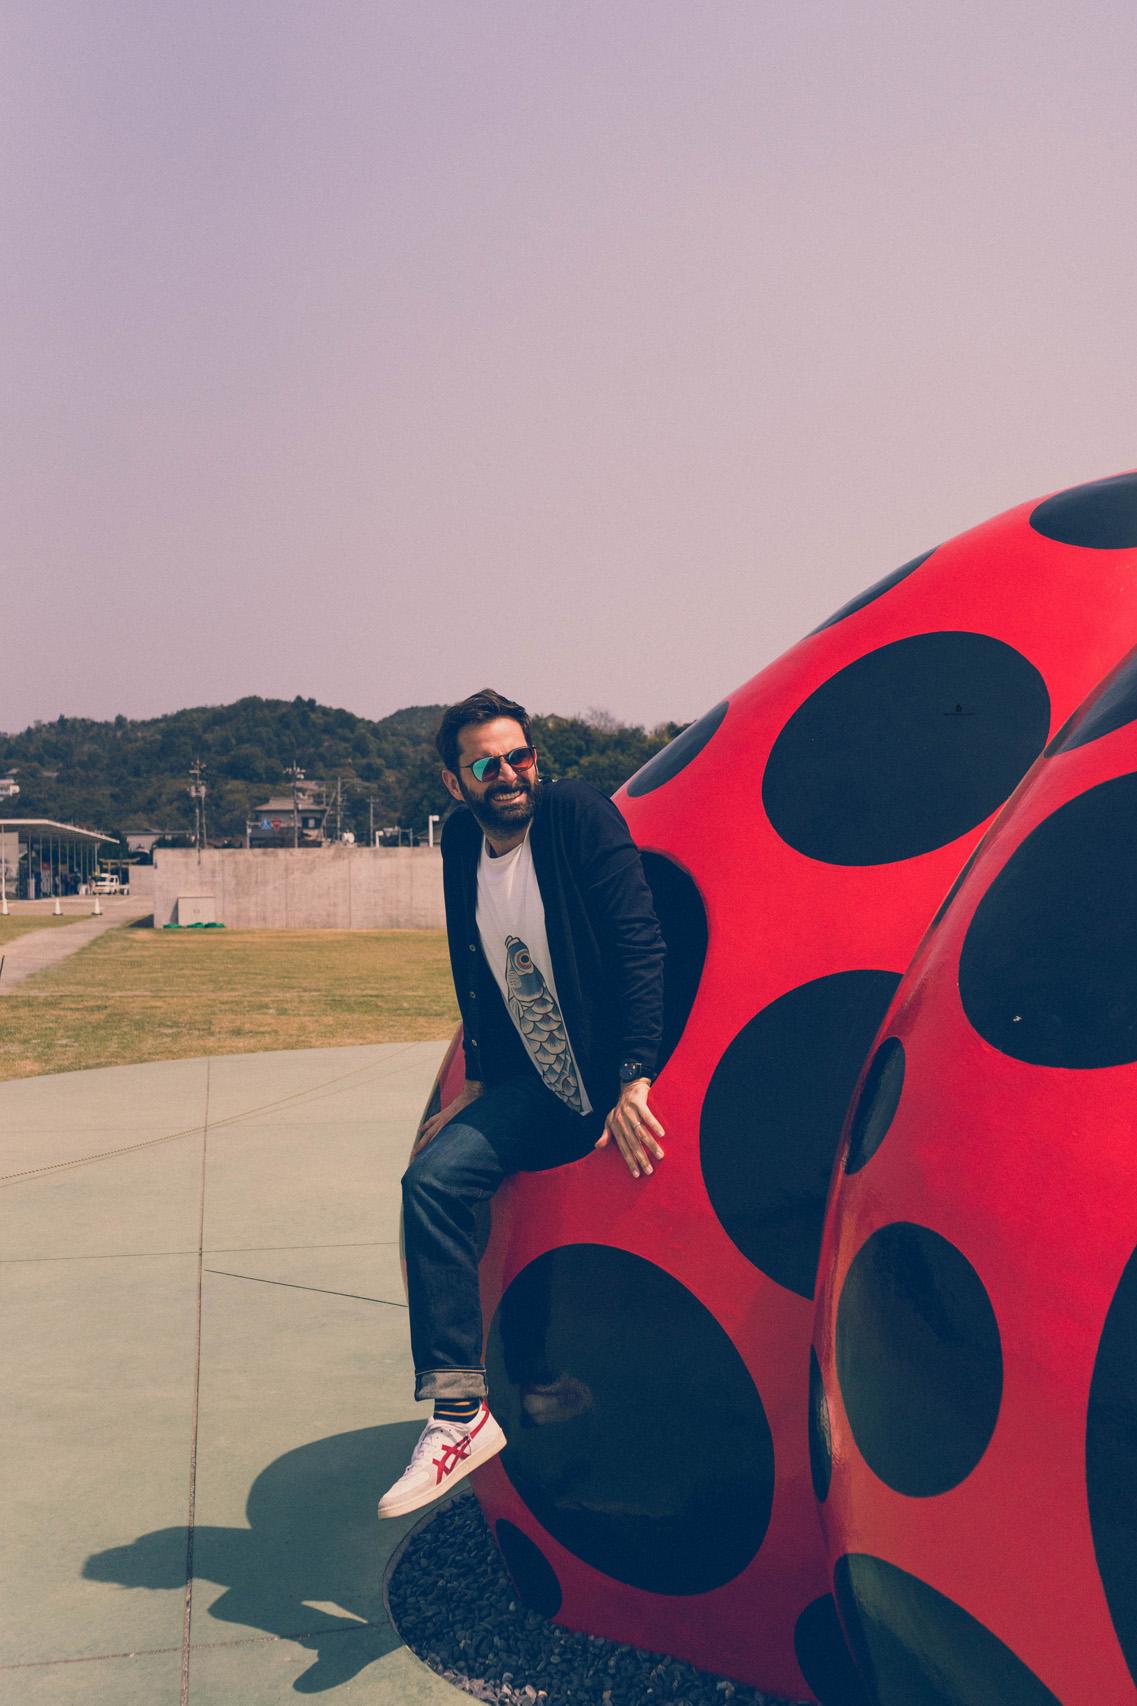 Yayoi Kusama's red and black pumpkin, Naoshima